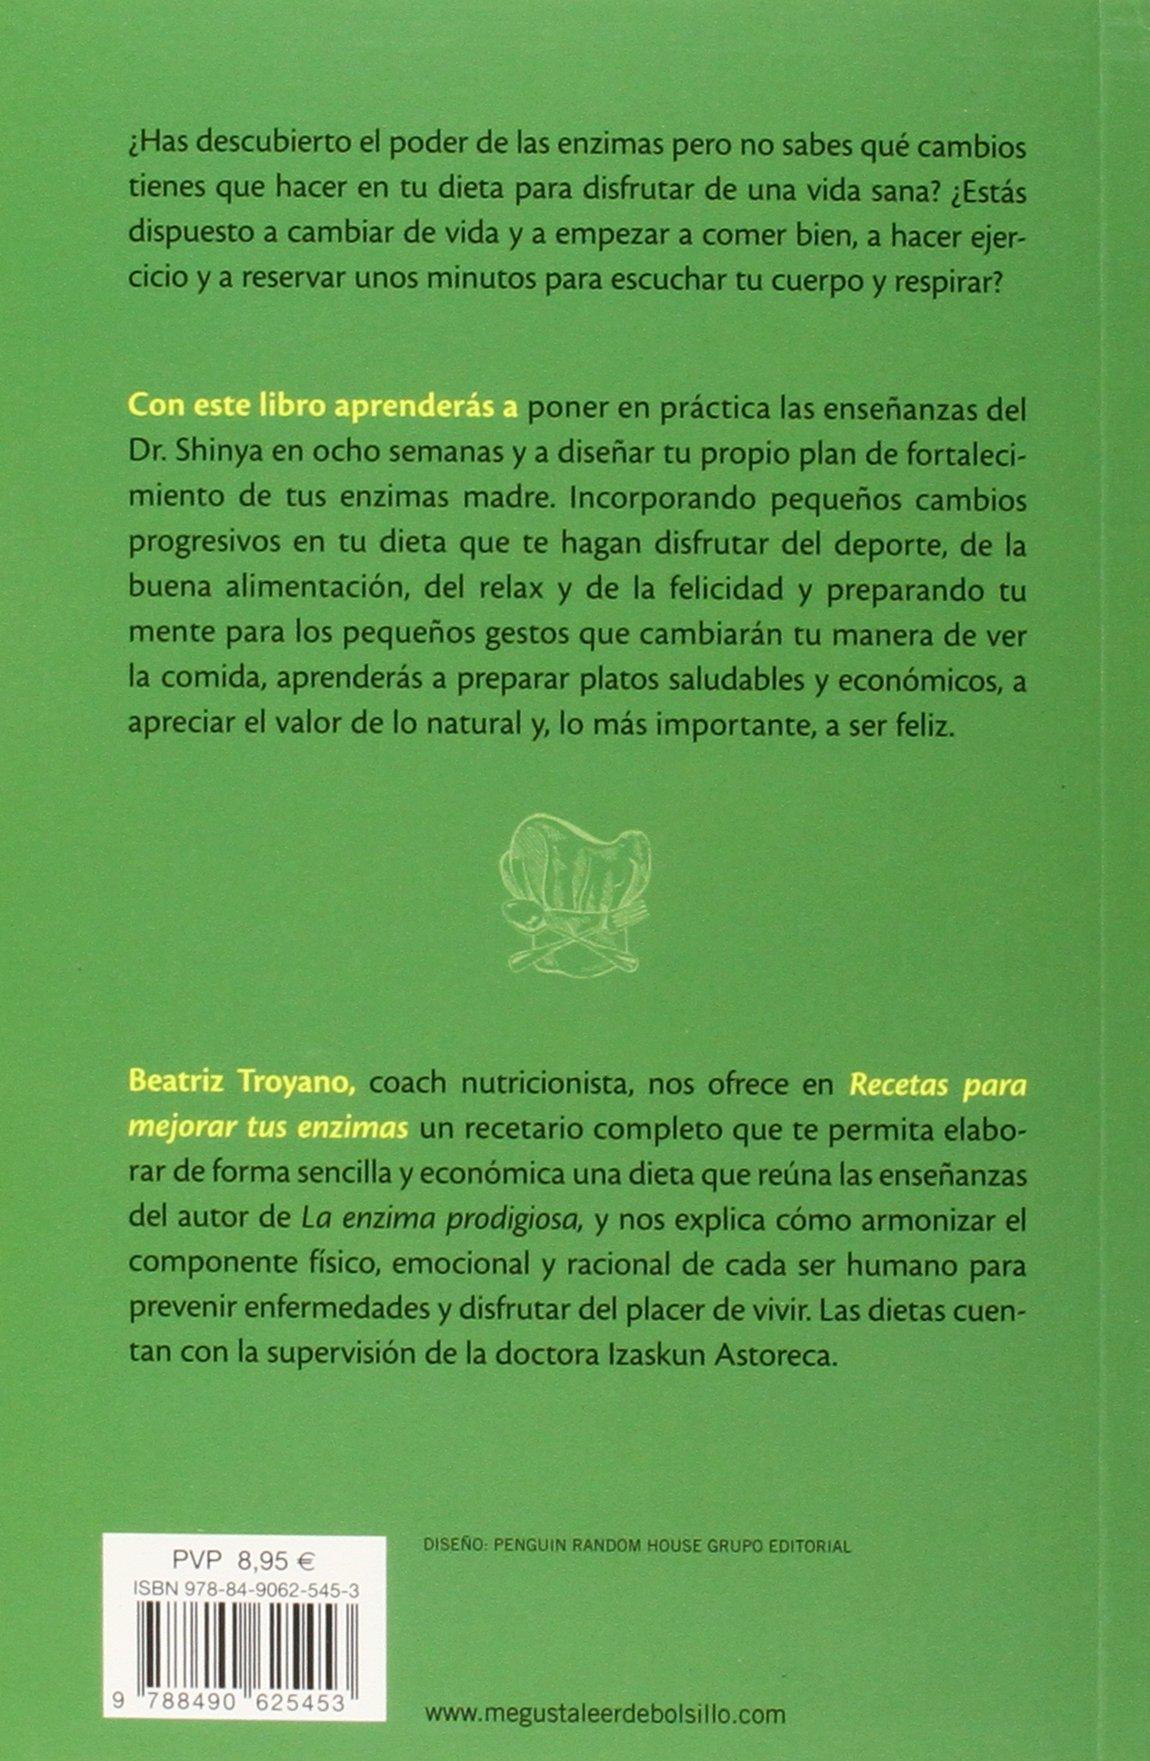 Recetas para mejorar tus enzimas (Spanish Edition): Beatriz ...